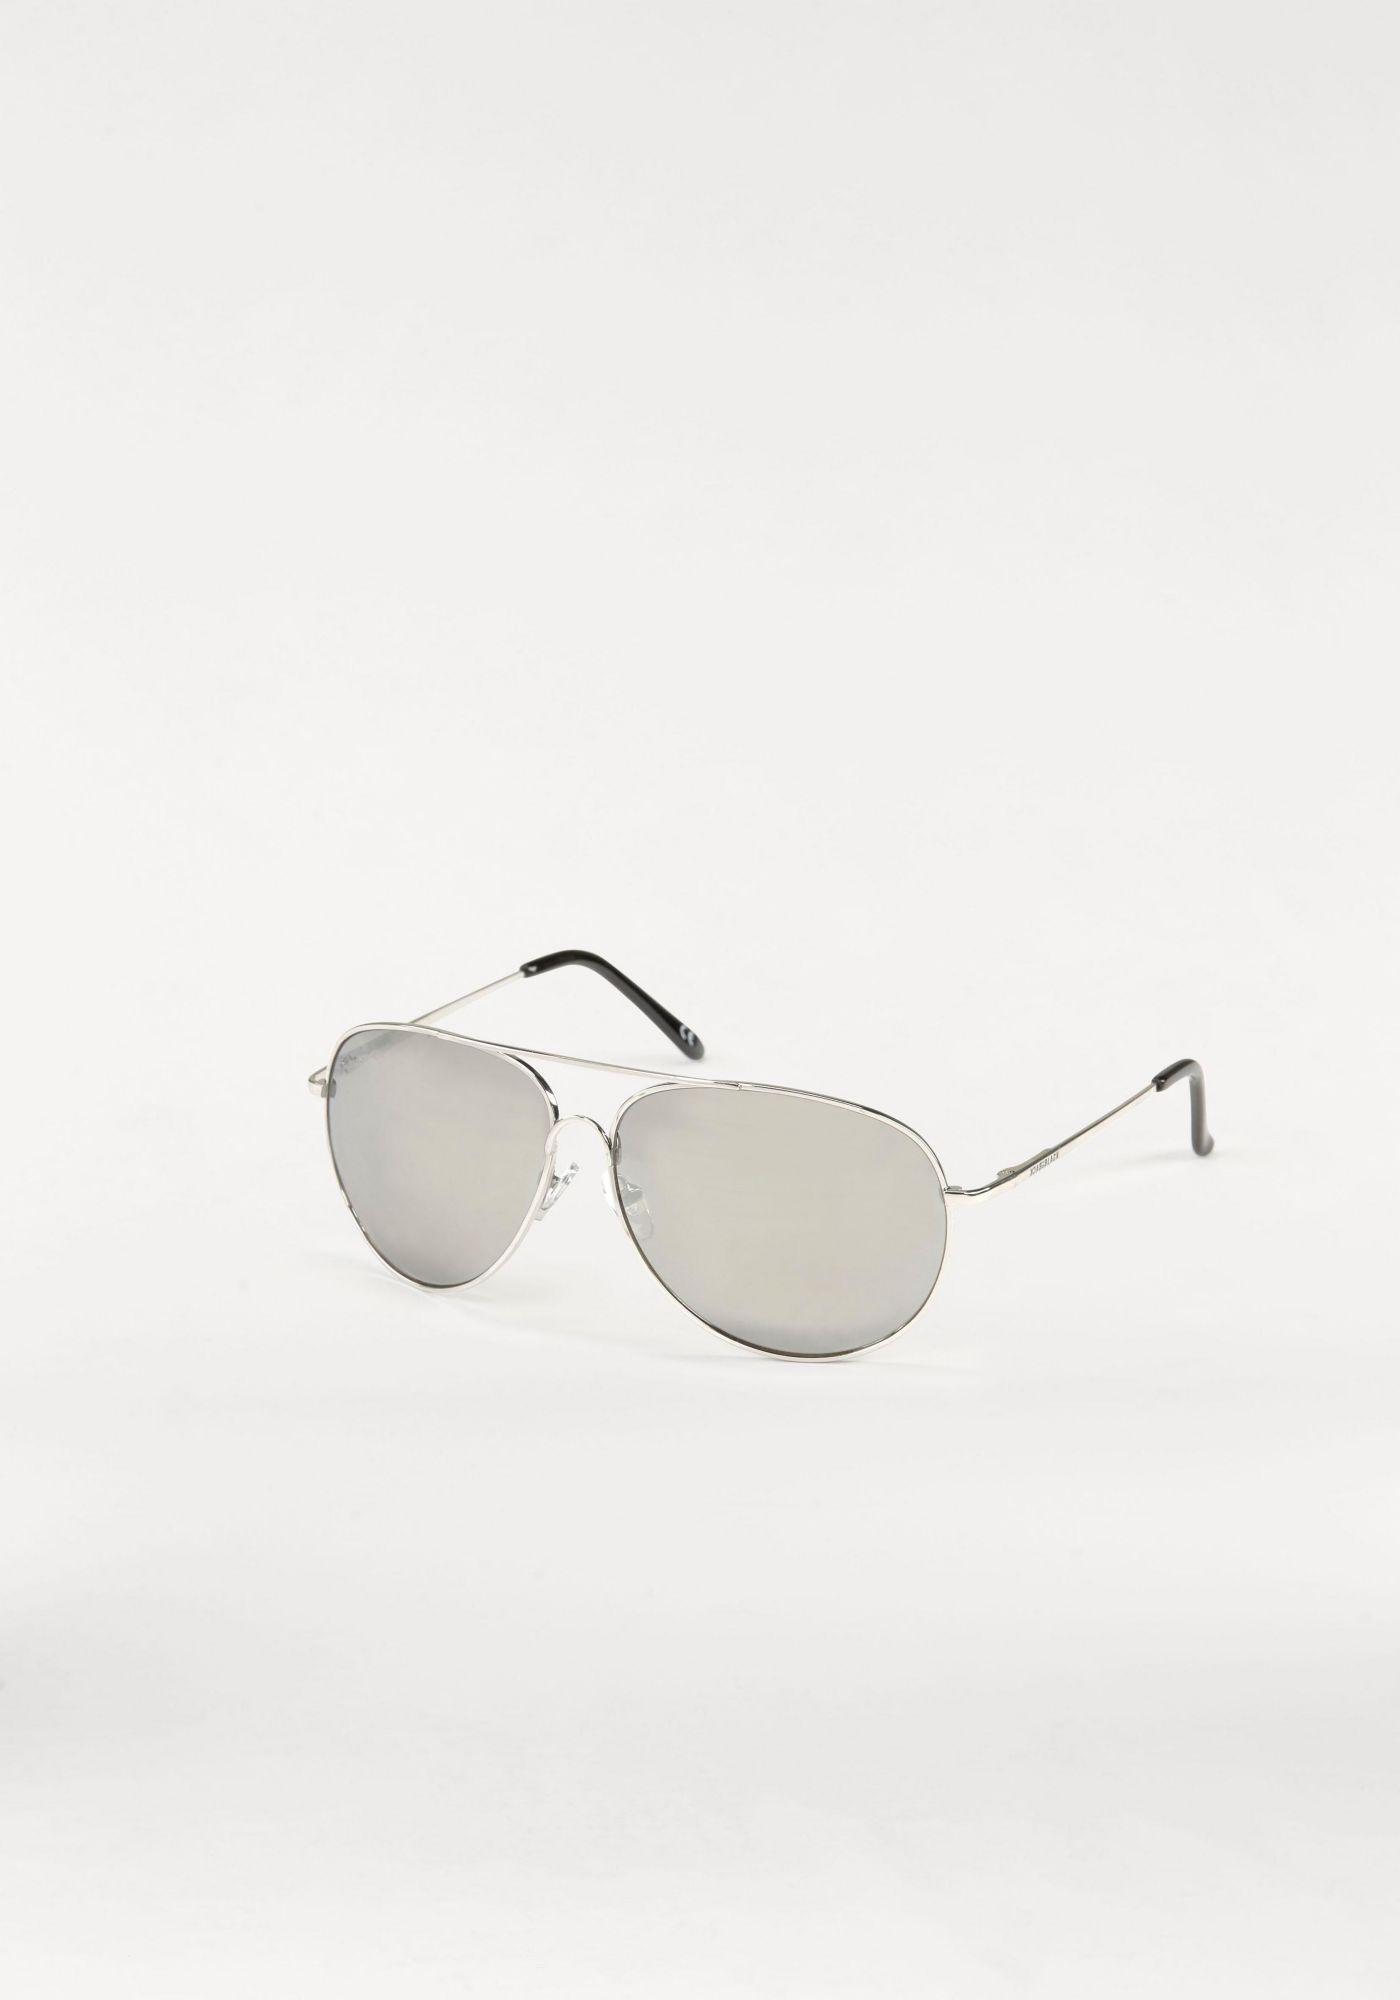 BACK IN BLACK EYEWEAR BACK IN BLACK Eyewear Sonnenbrille